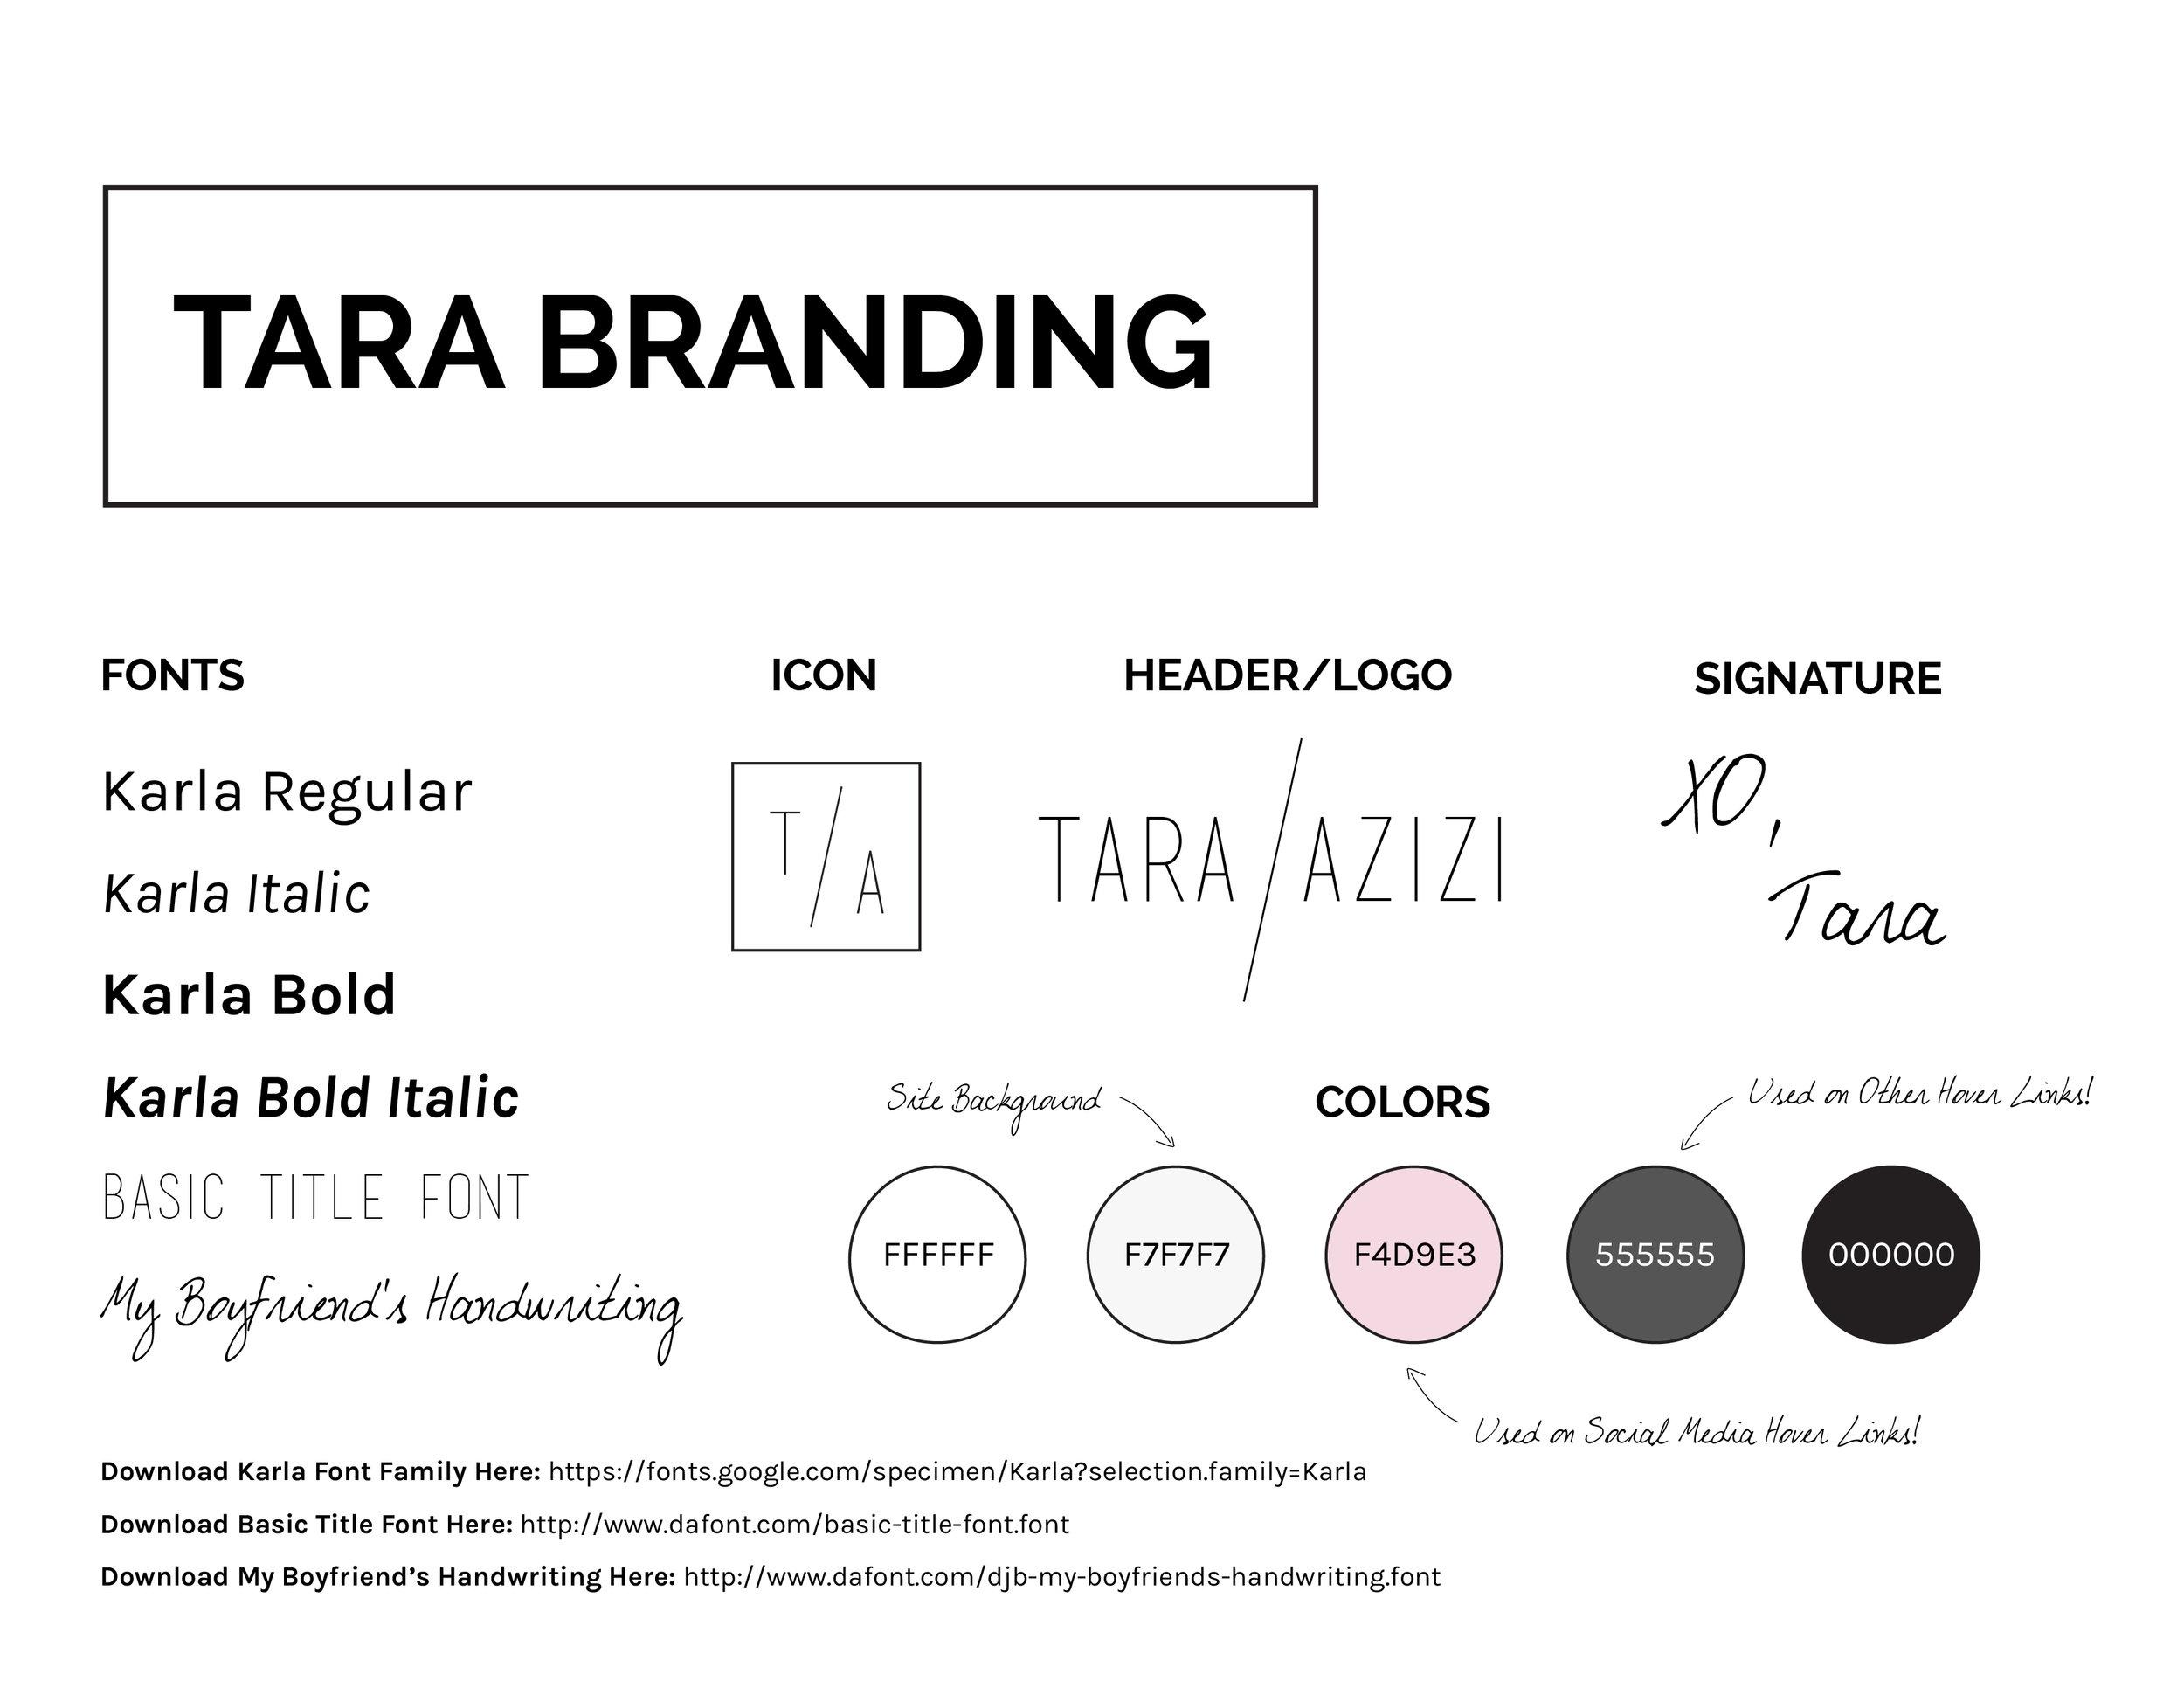 ACC-TaraAzizi-Branding.jpg